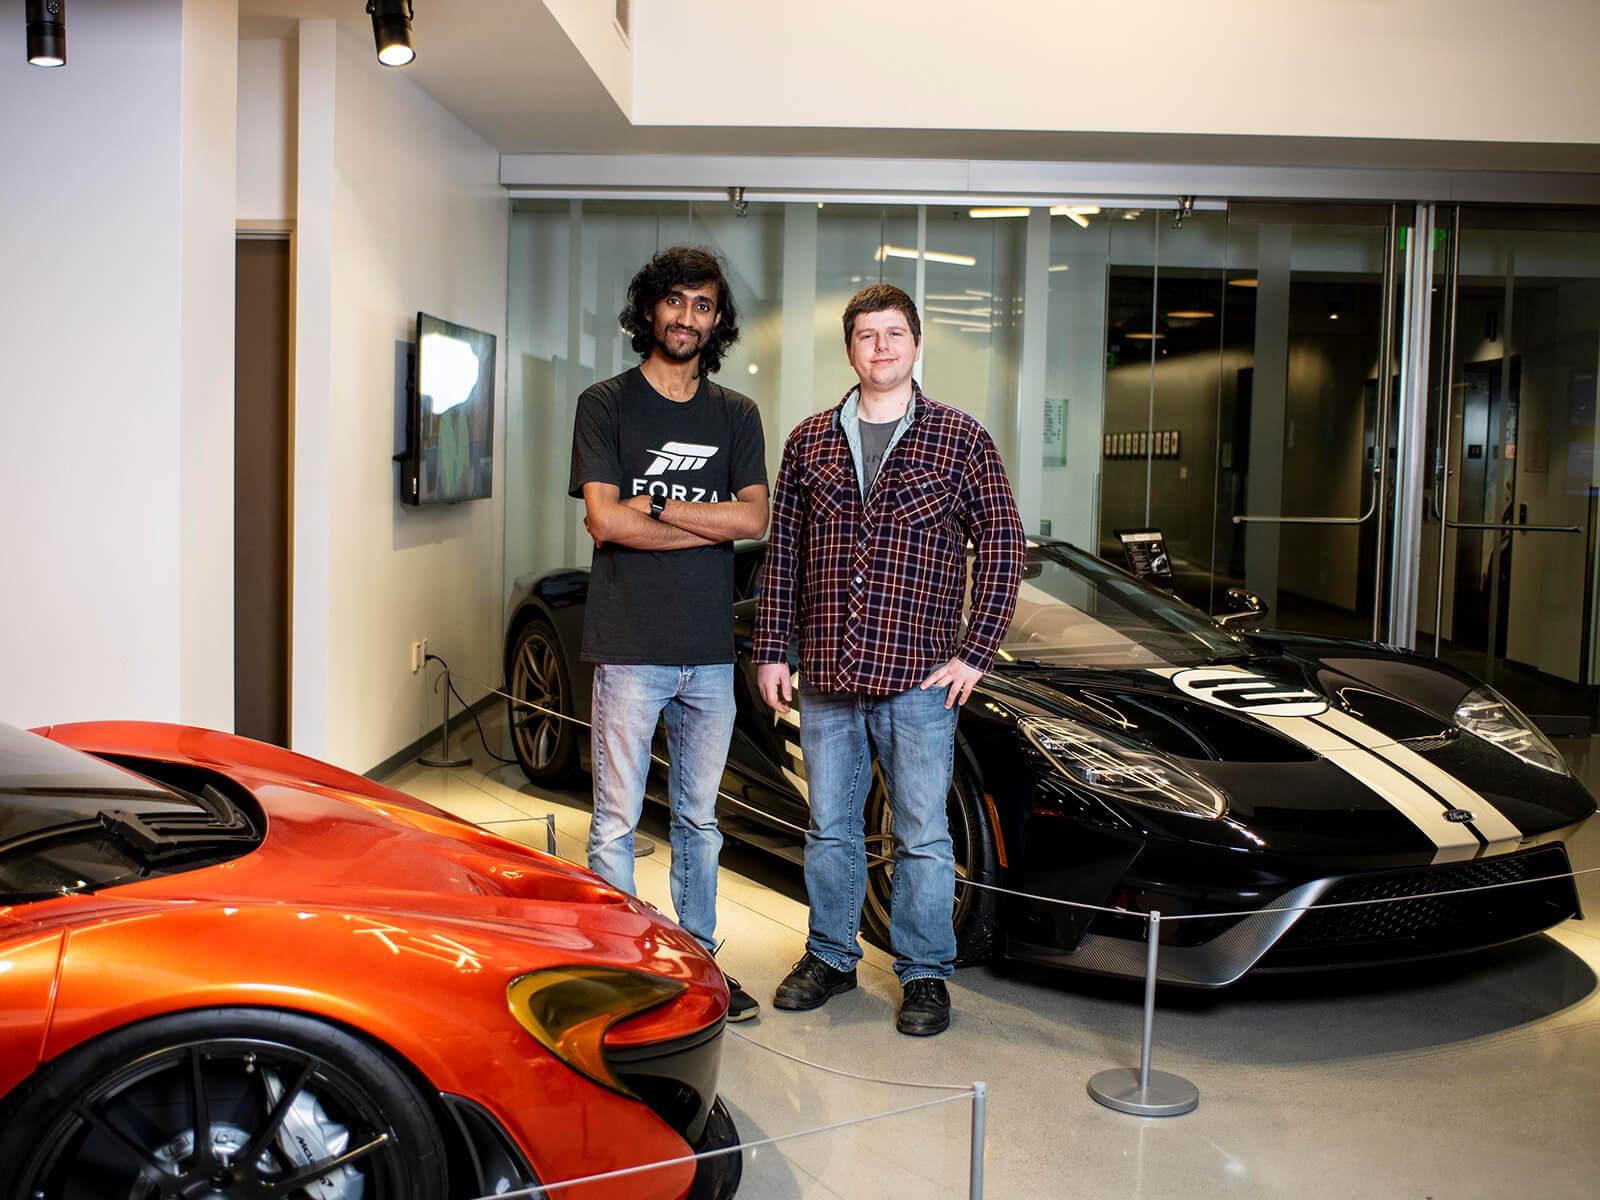 Michael Pitaniello and Deepak Chennakkadan stand next to luxury cars in the Turn 10 Studios lobby.